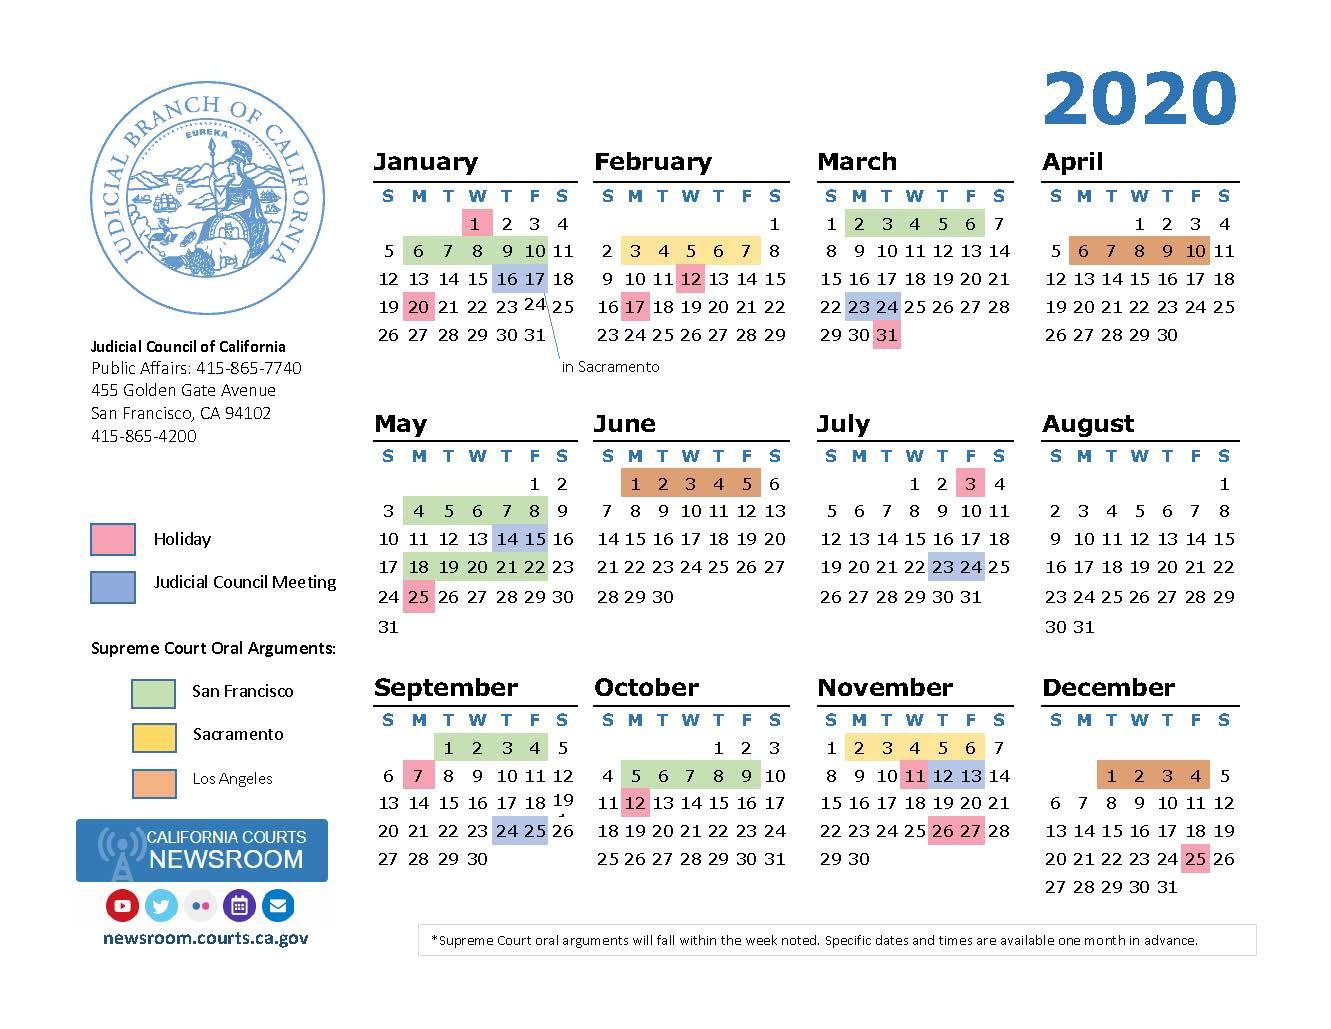 2020 California Courts Calendar | California Courts Newsroom within Los Angeles Superior Court Calendar